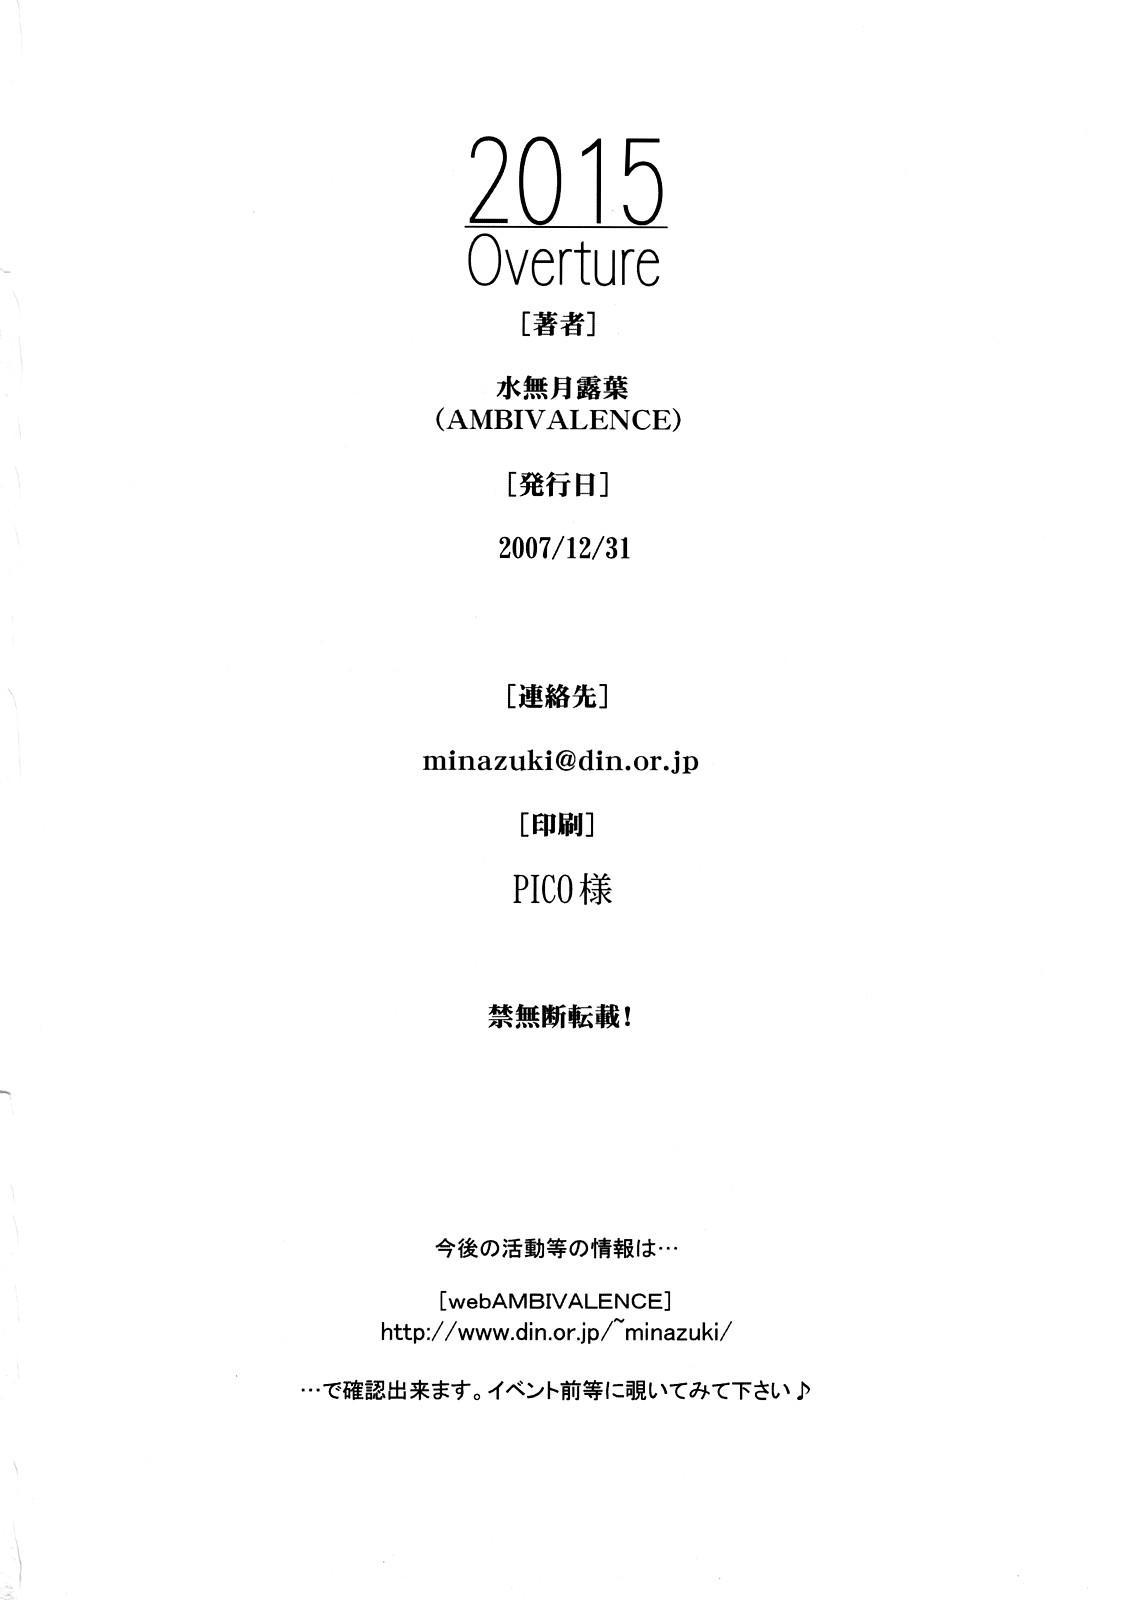 2015 Overture 20